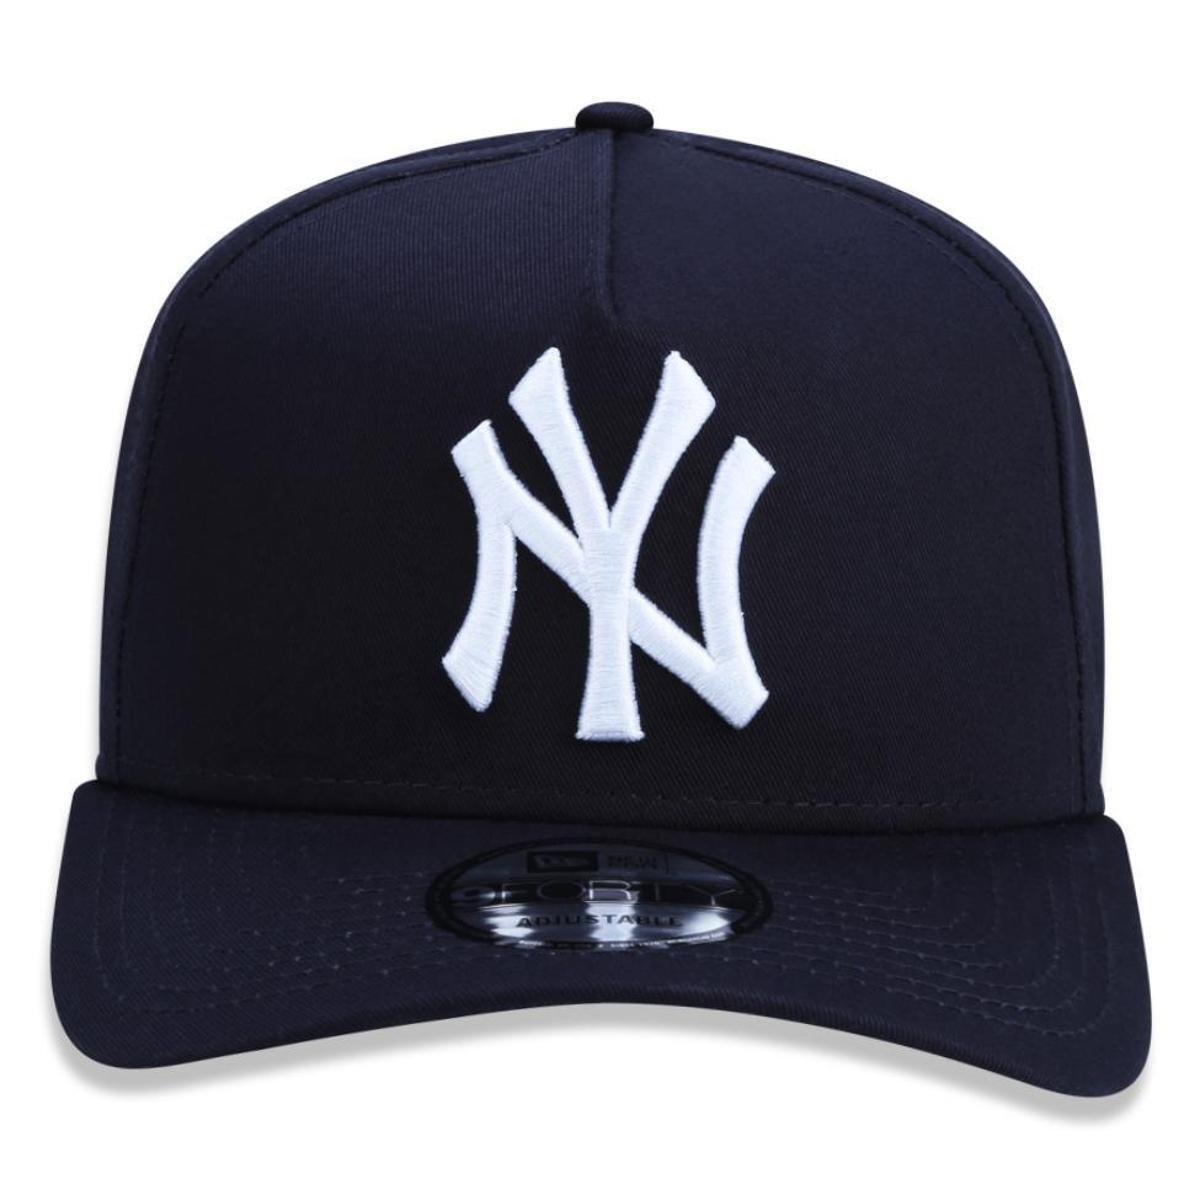 82672614738a5 Boné 940 A-frame New York Yankees MLB Aba Curva New Era - Compre Agora